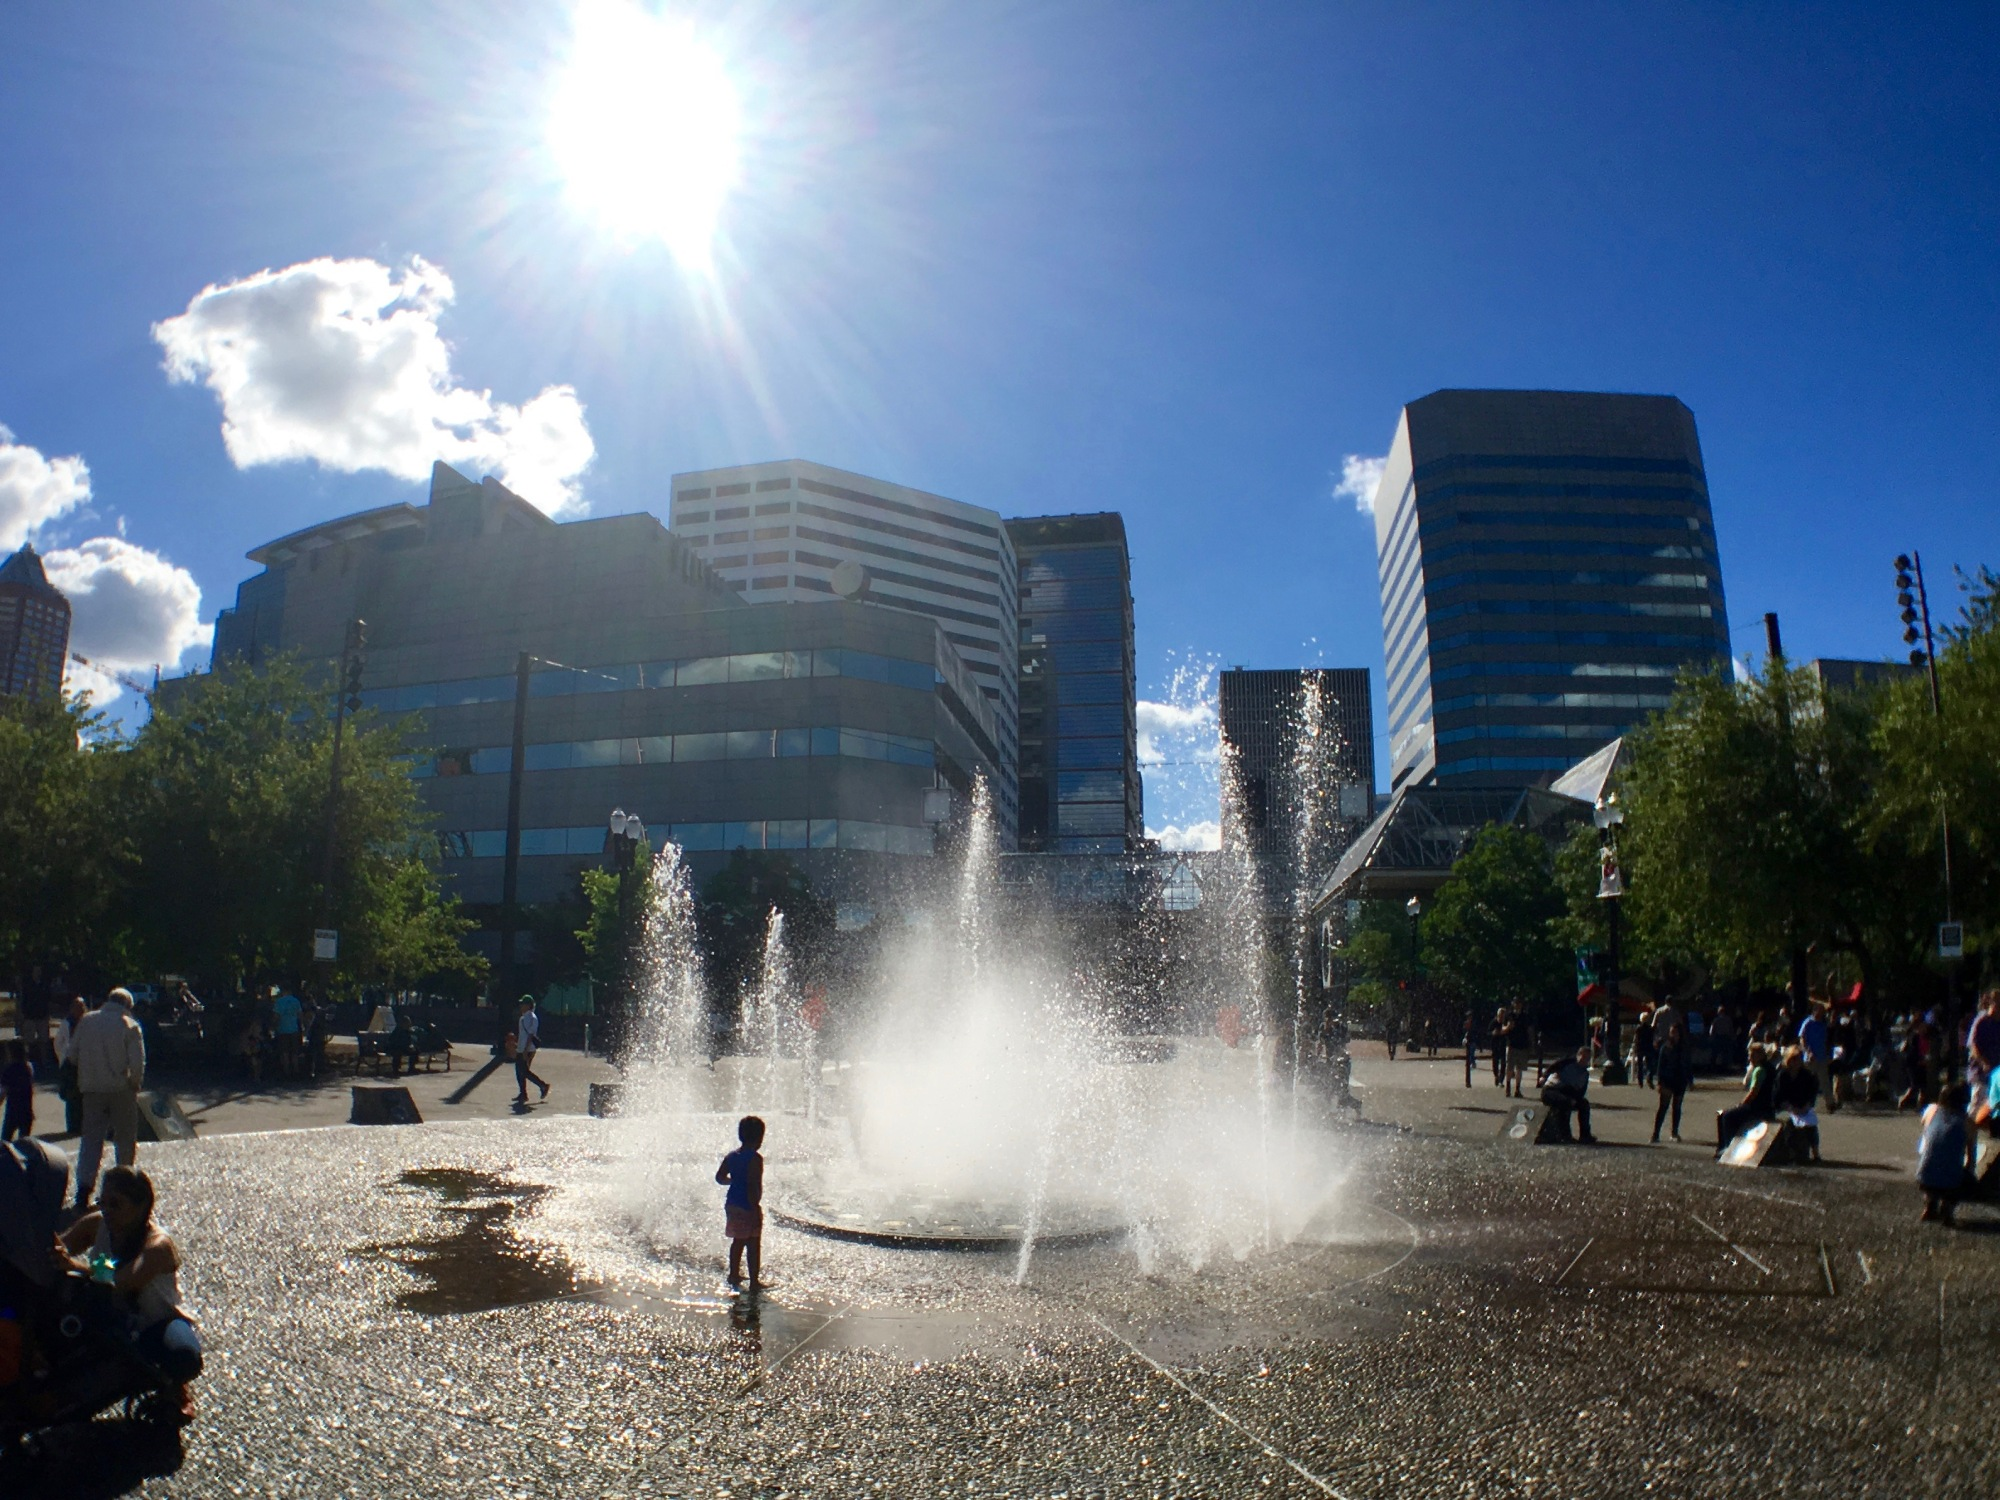 SALMON STREET SPRINGS ,サーモン・ストリート・スプリングス,噴水、水遊び、OYAKO PORTLAND, ポートランド